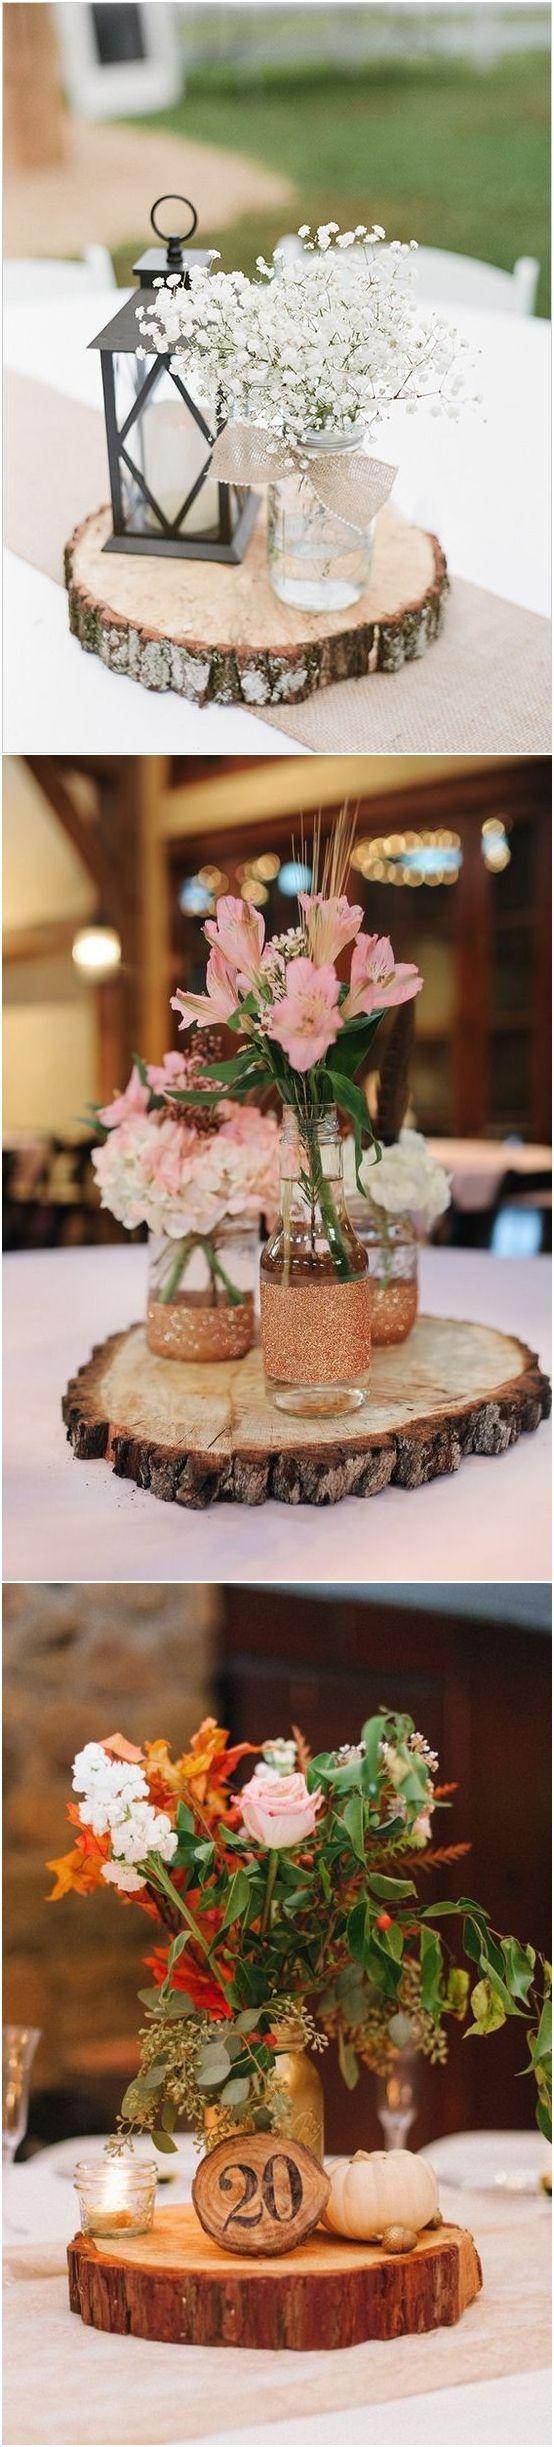 Rustic Woodsy Wedding Trend 2018 Tree Stump Wedding Centerpieces